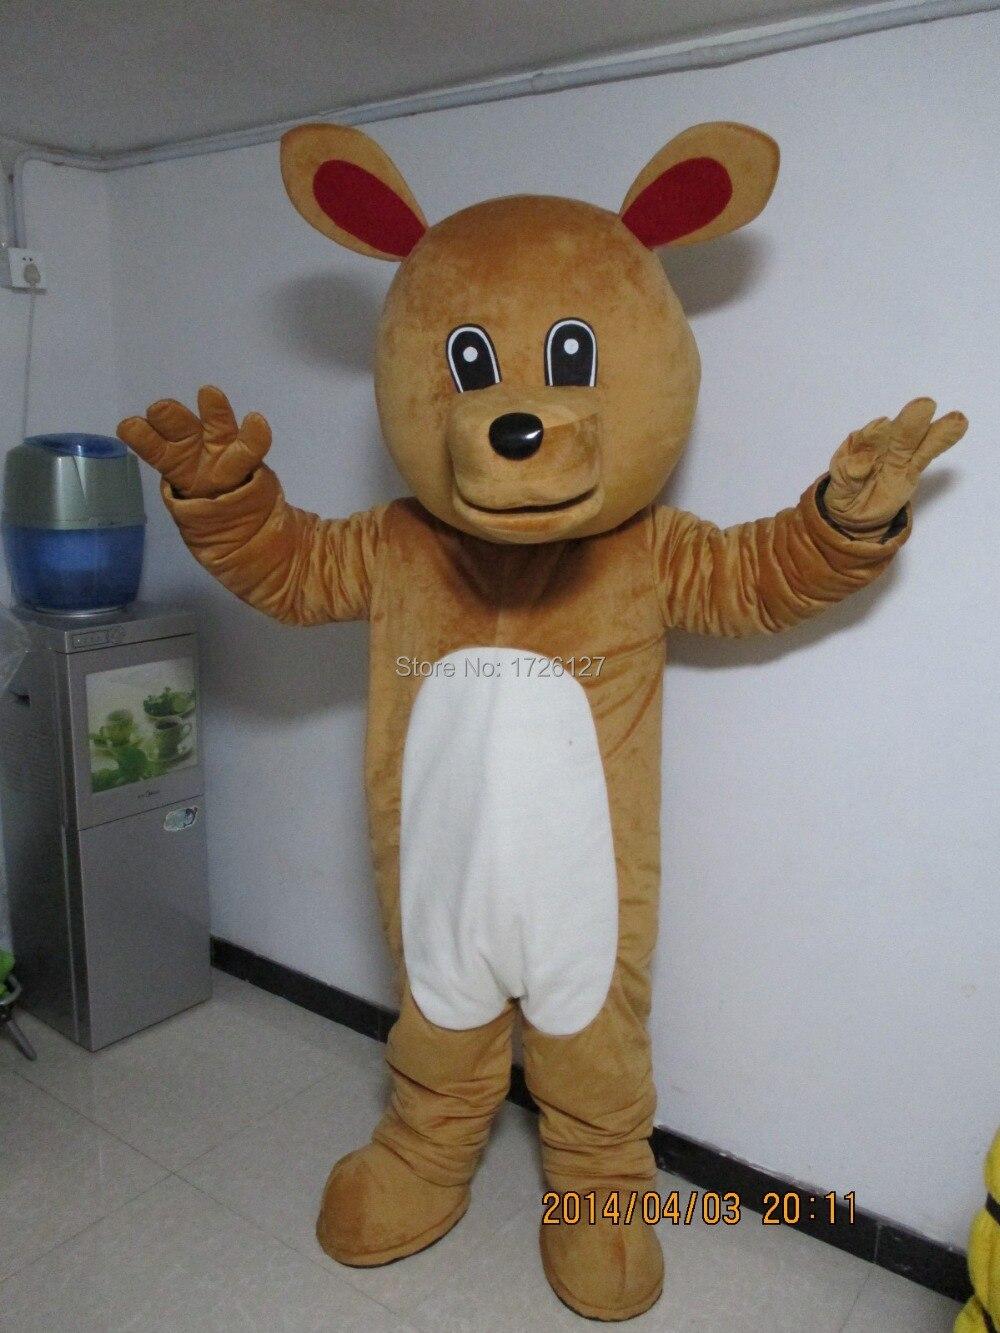 Mascota marrón disfraz de la mascota del oso personalizado disfraz de fantasía anime kits de cosplay mascotte disfraz de Carnaval